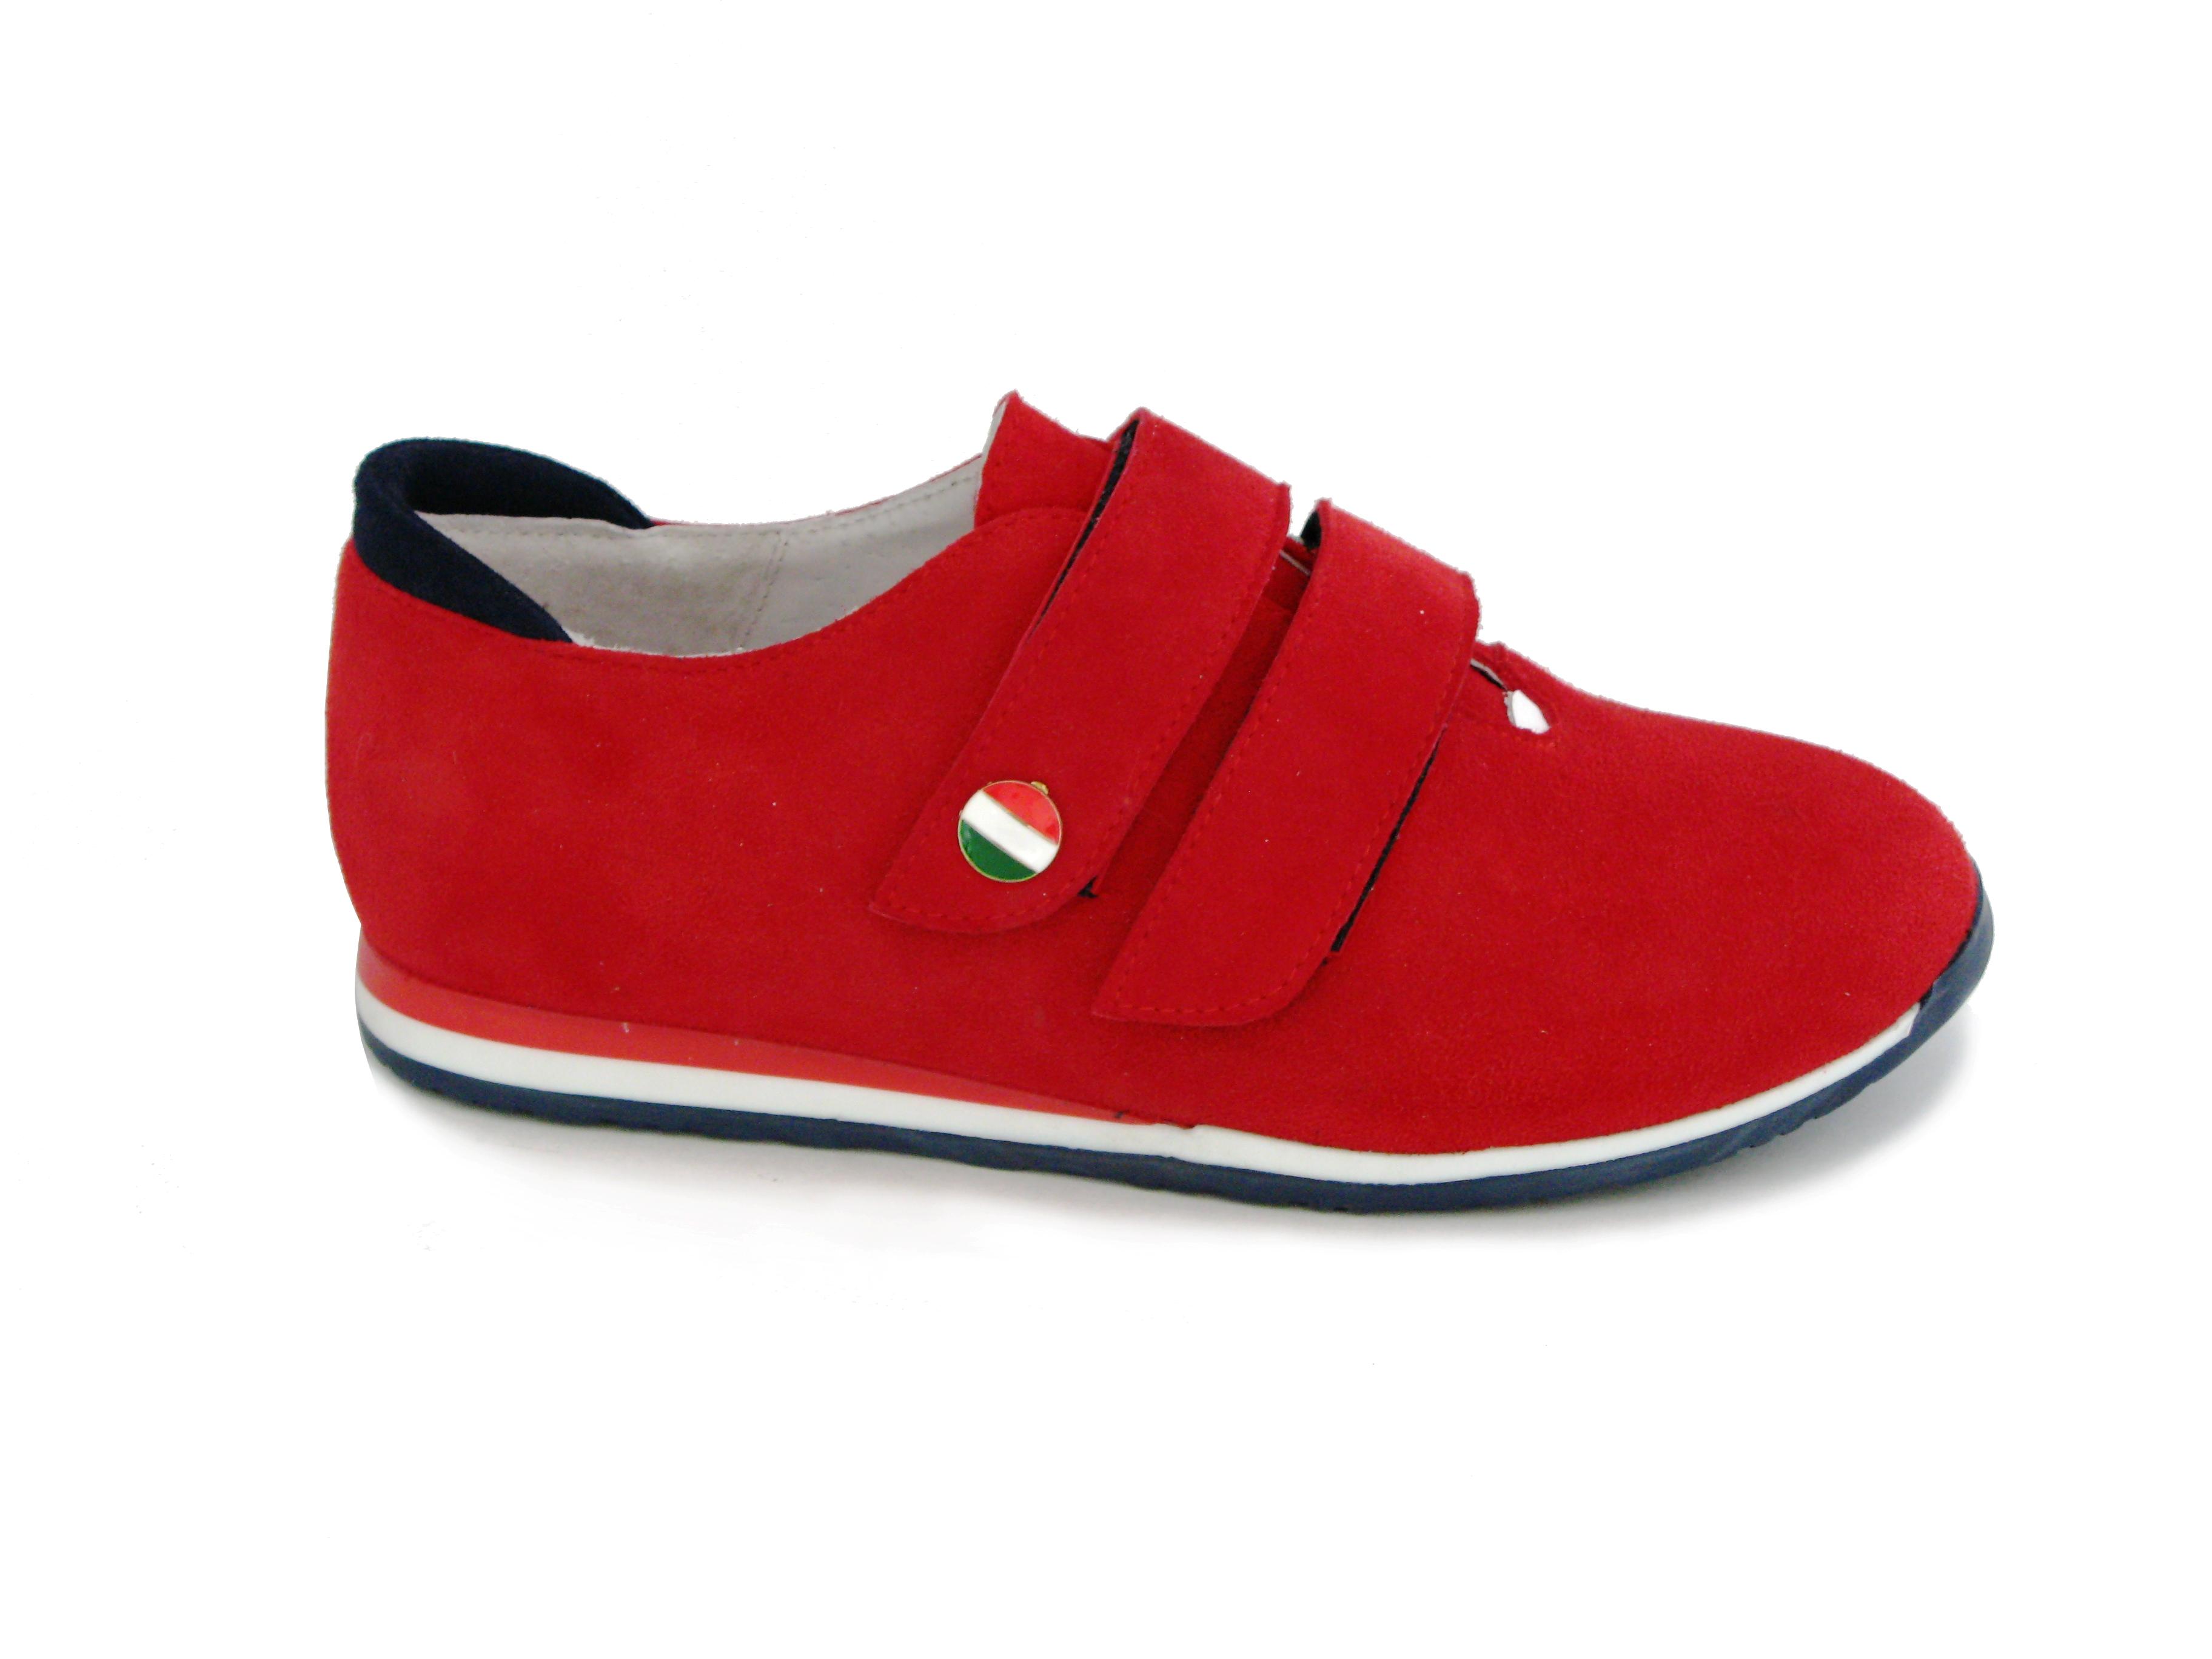 1948f485a99633 Кеди Giorgio Vito купити в Україні - Товари - Брендове взуття ...